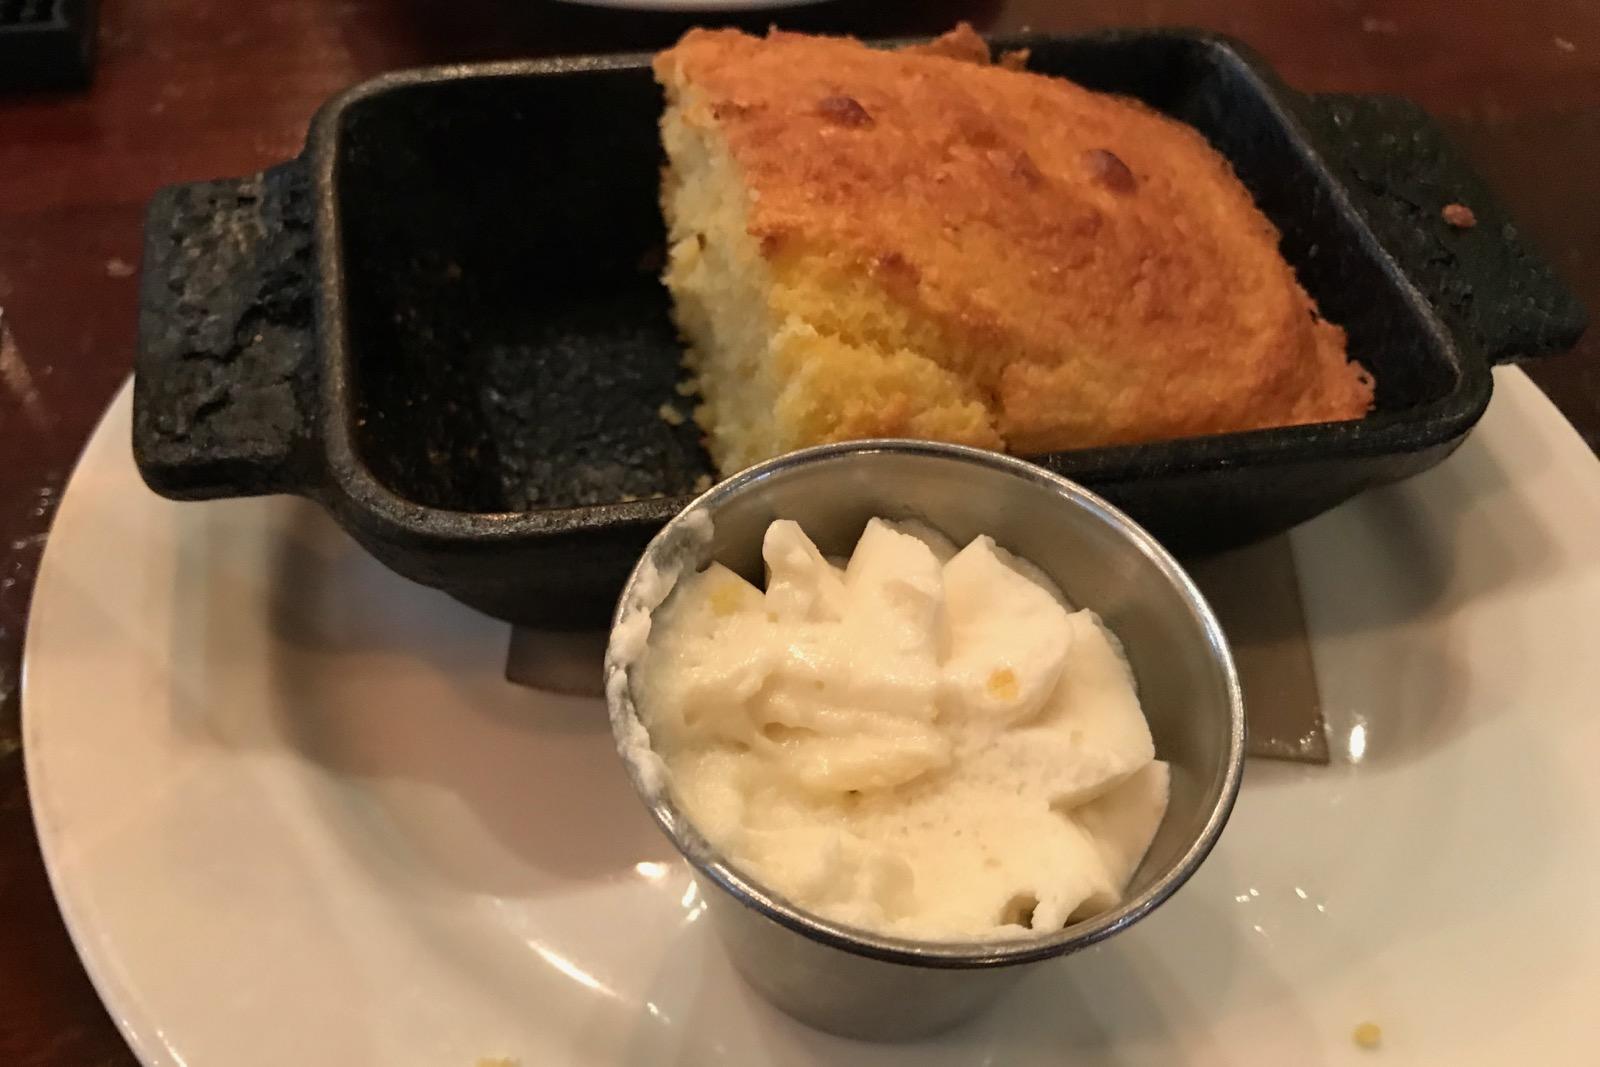 http://blog.rickk.com/food/2018/08/19/ate.2018.08.15.d2.jpg